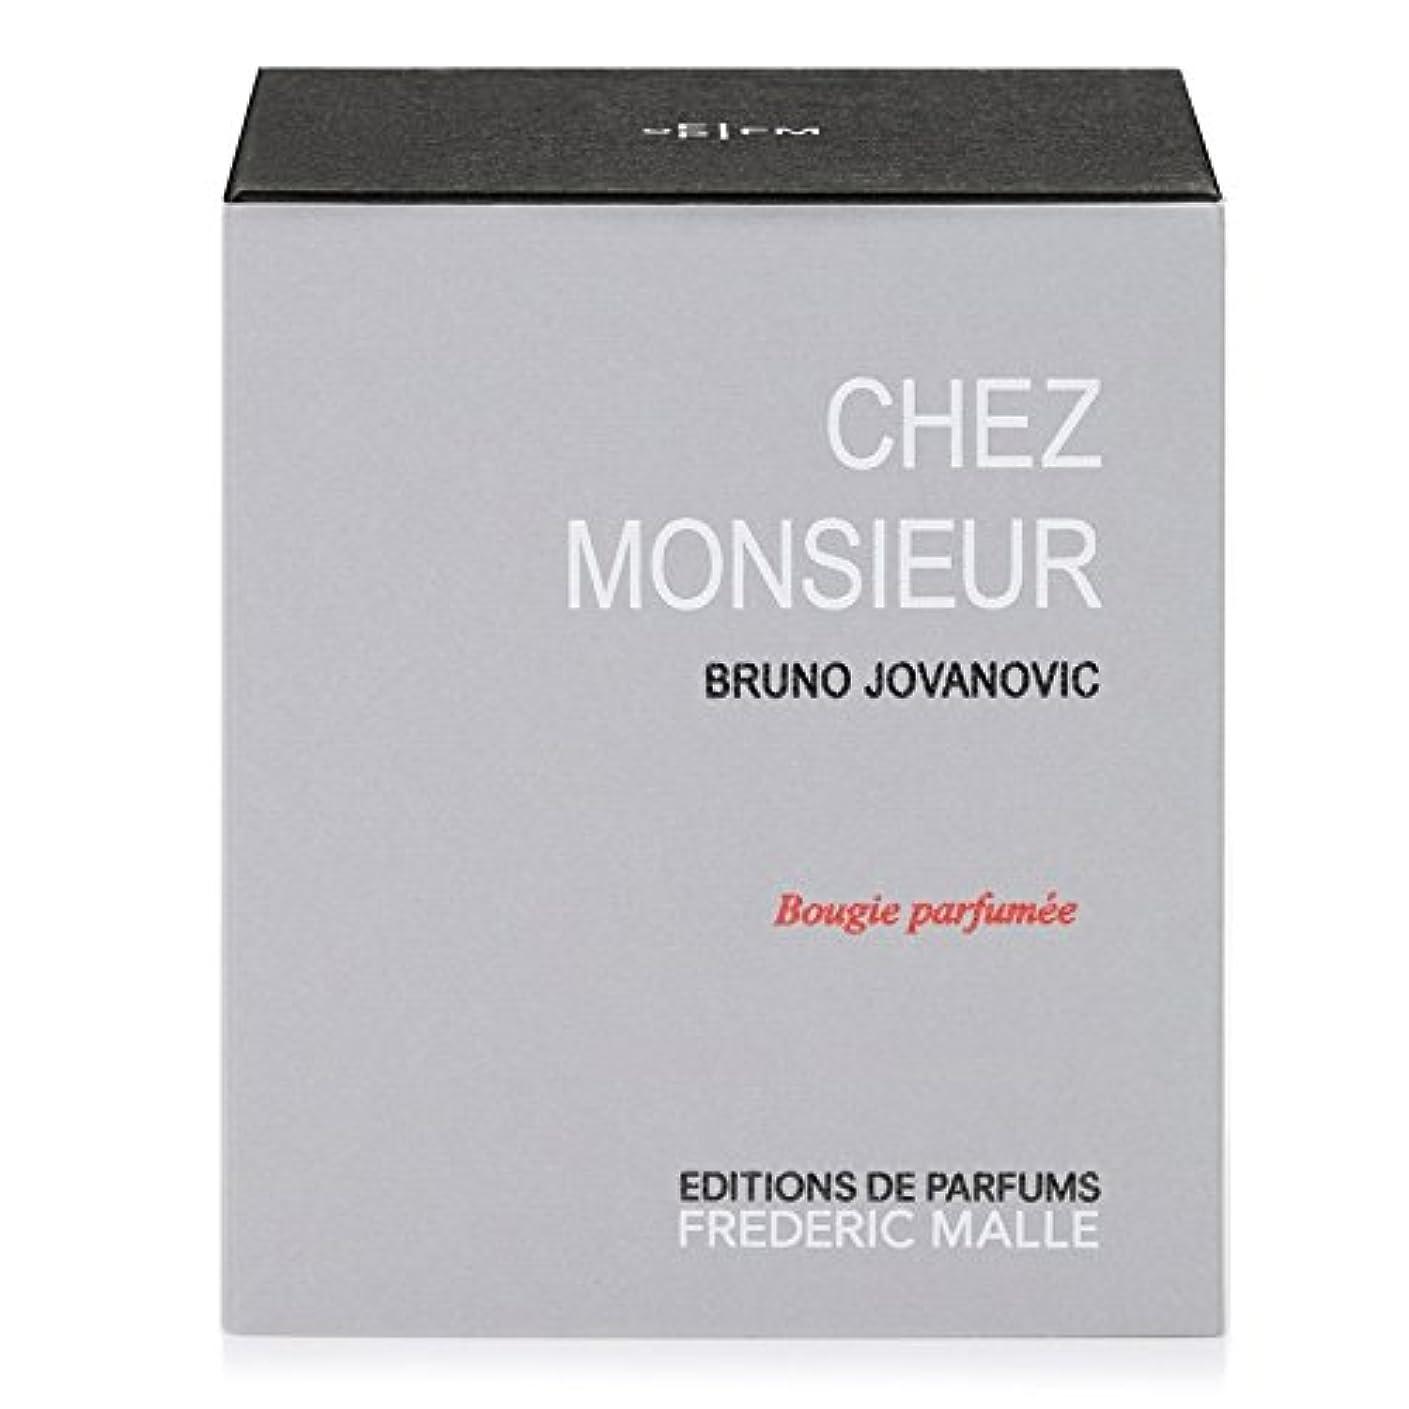 Frederic Malle Chez Monsieur Scented Candle 220g (Pack of 2) - フレデリック?マルシェムッシュ香りのキャンドル220グラム x2 [並行輸入品]